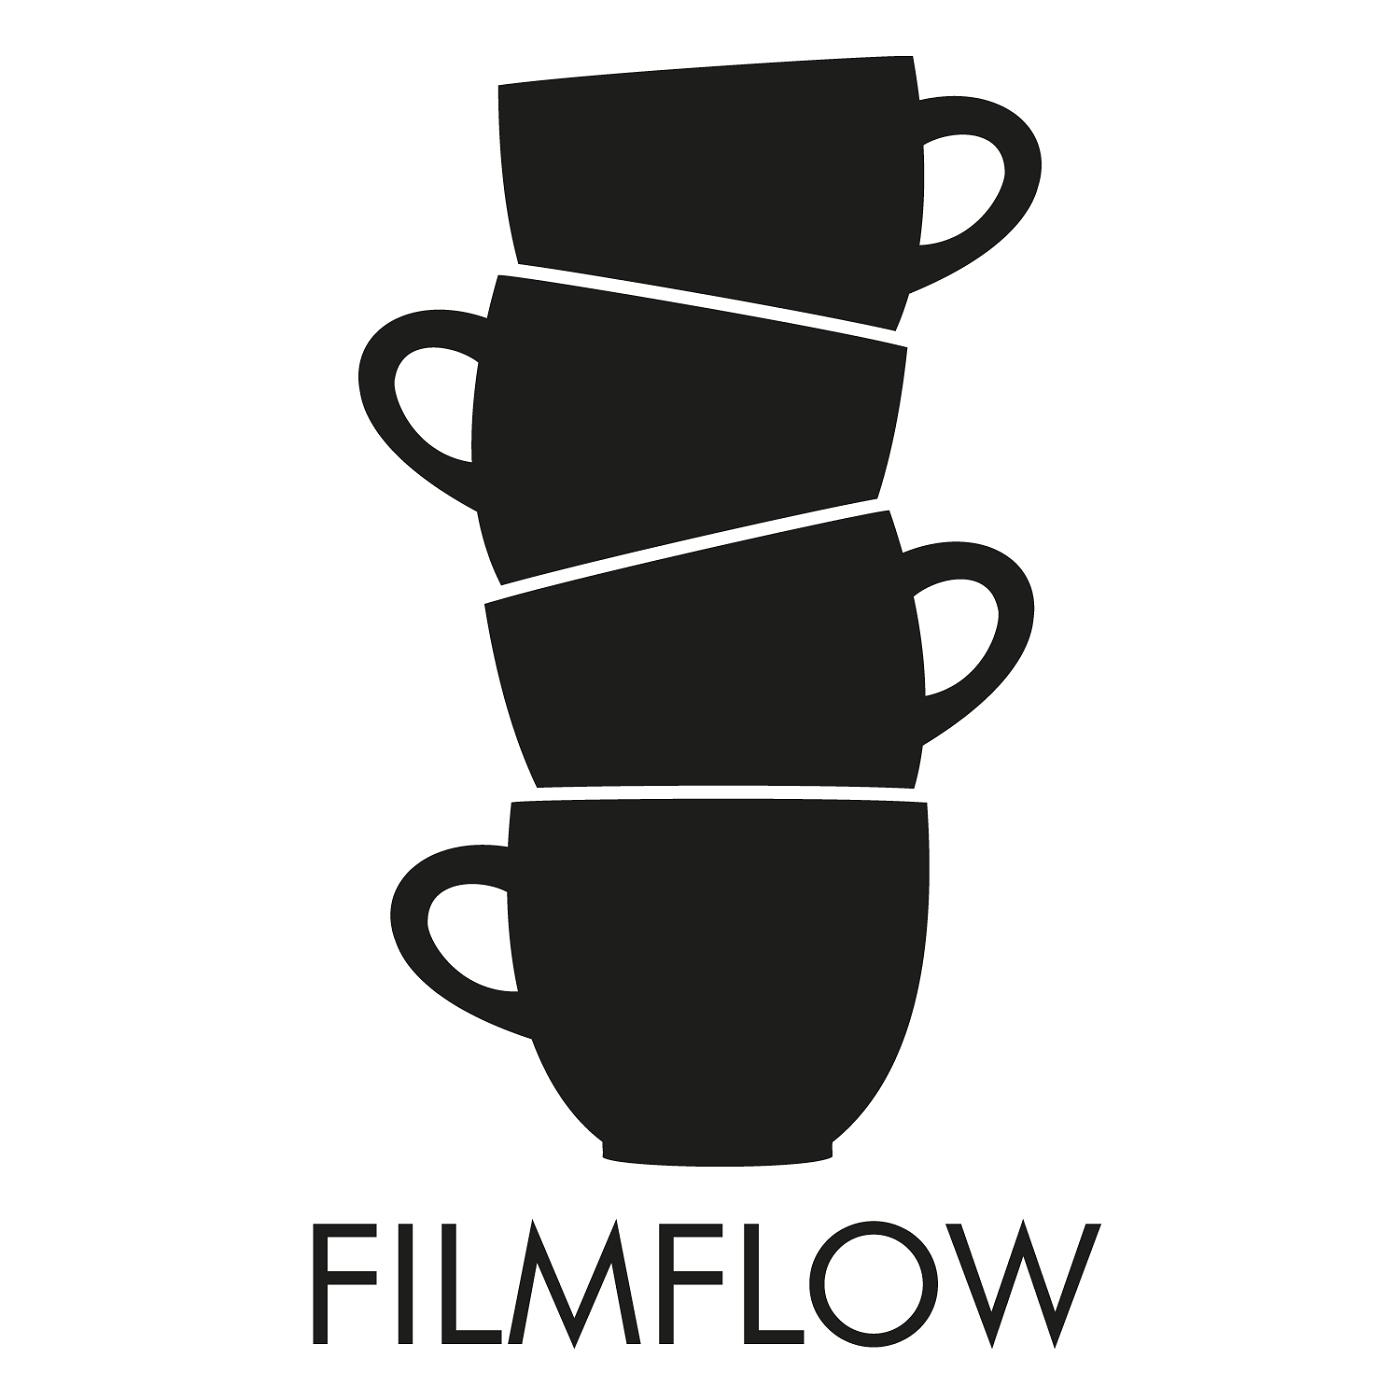 FilmFlow